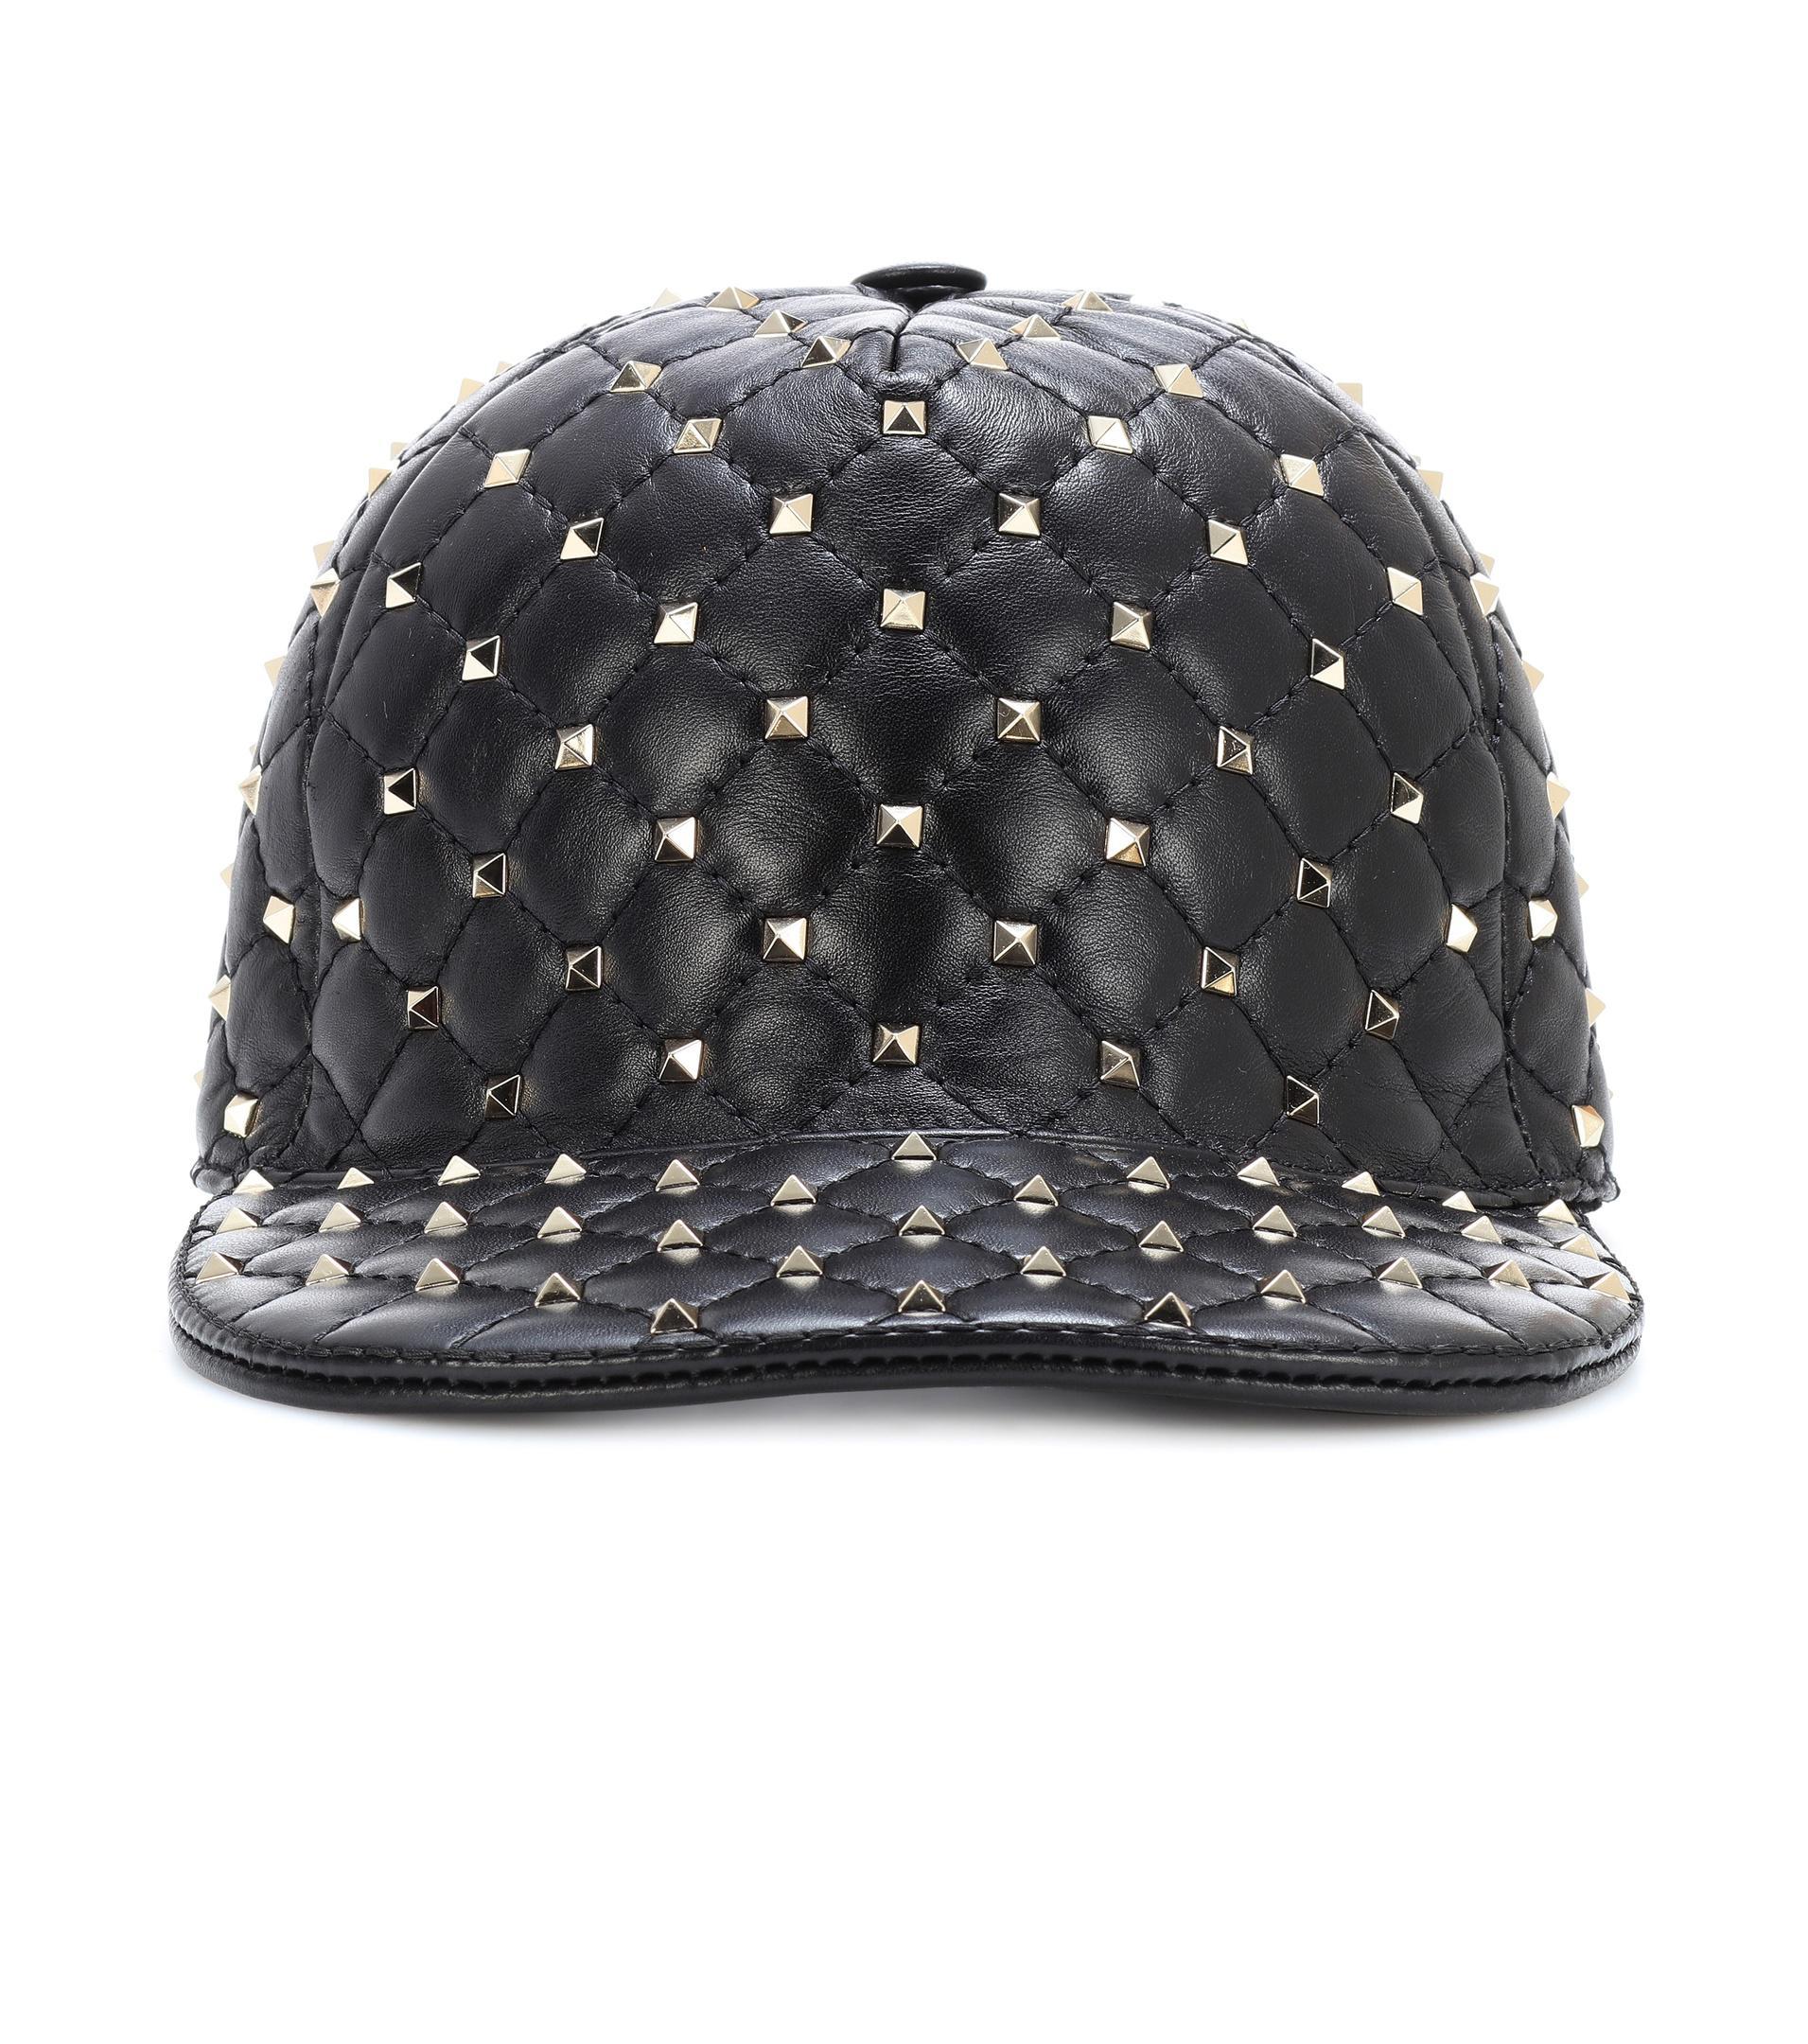 7ada2b99852 Lyst - Valentino Rockstud Spike Leather Cap in Black